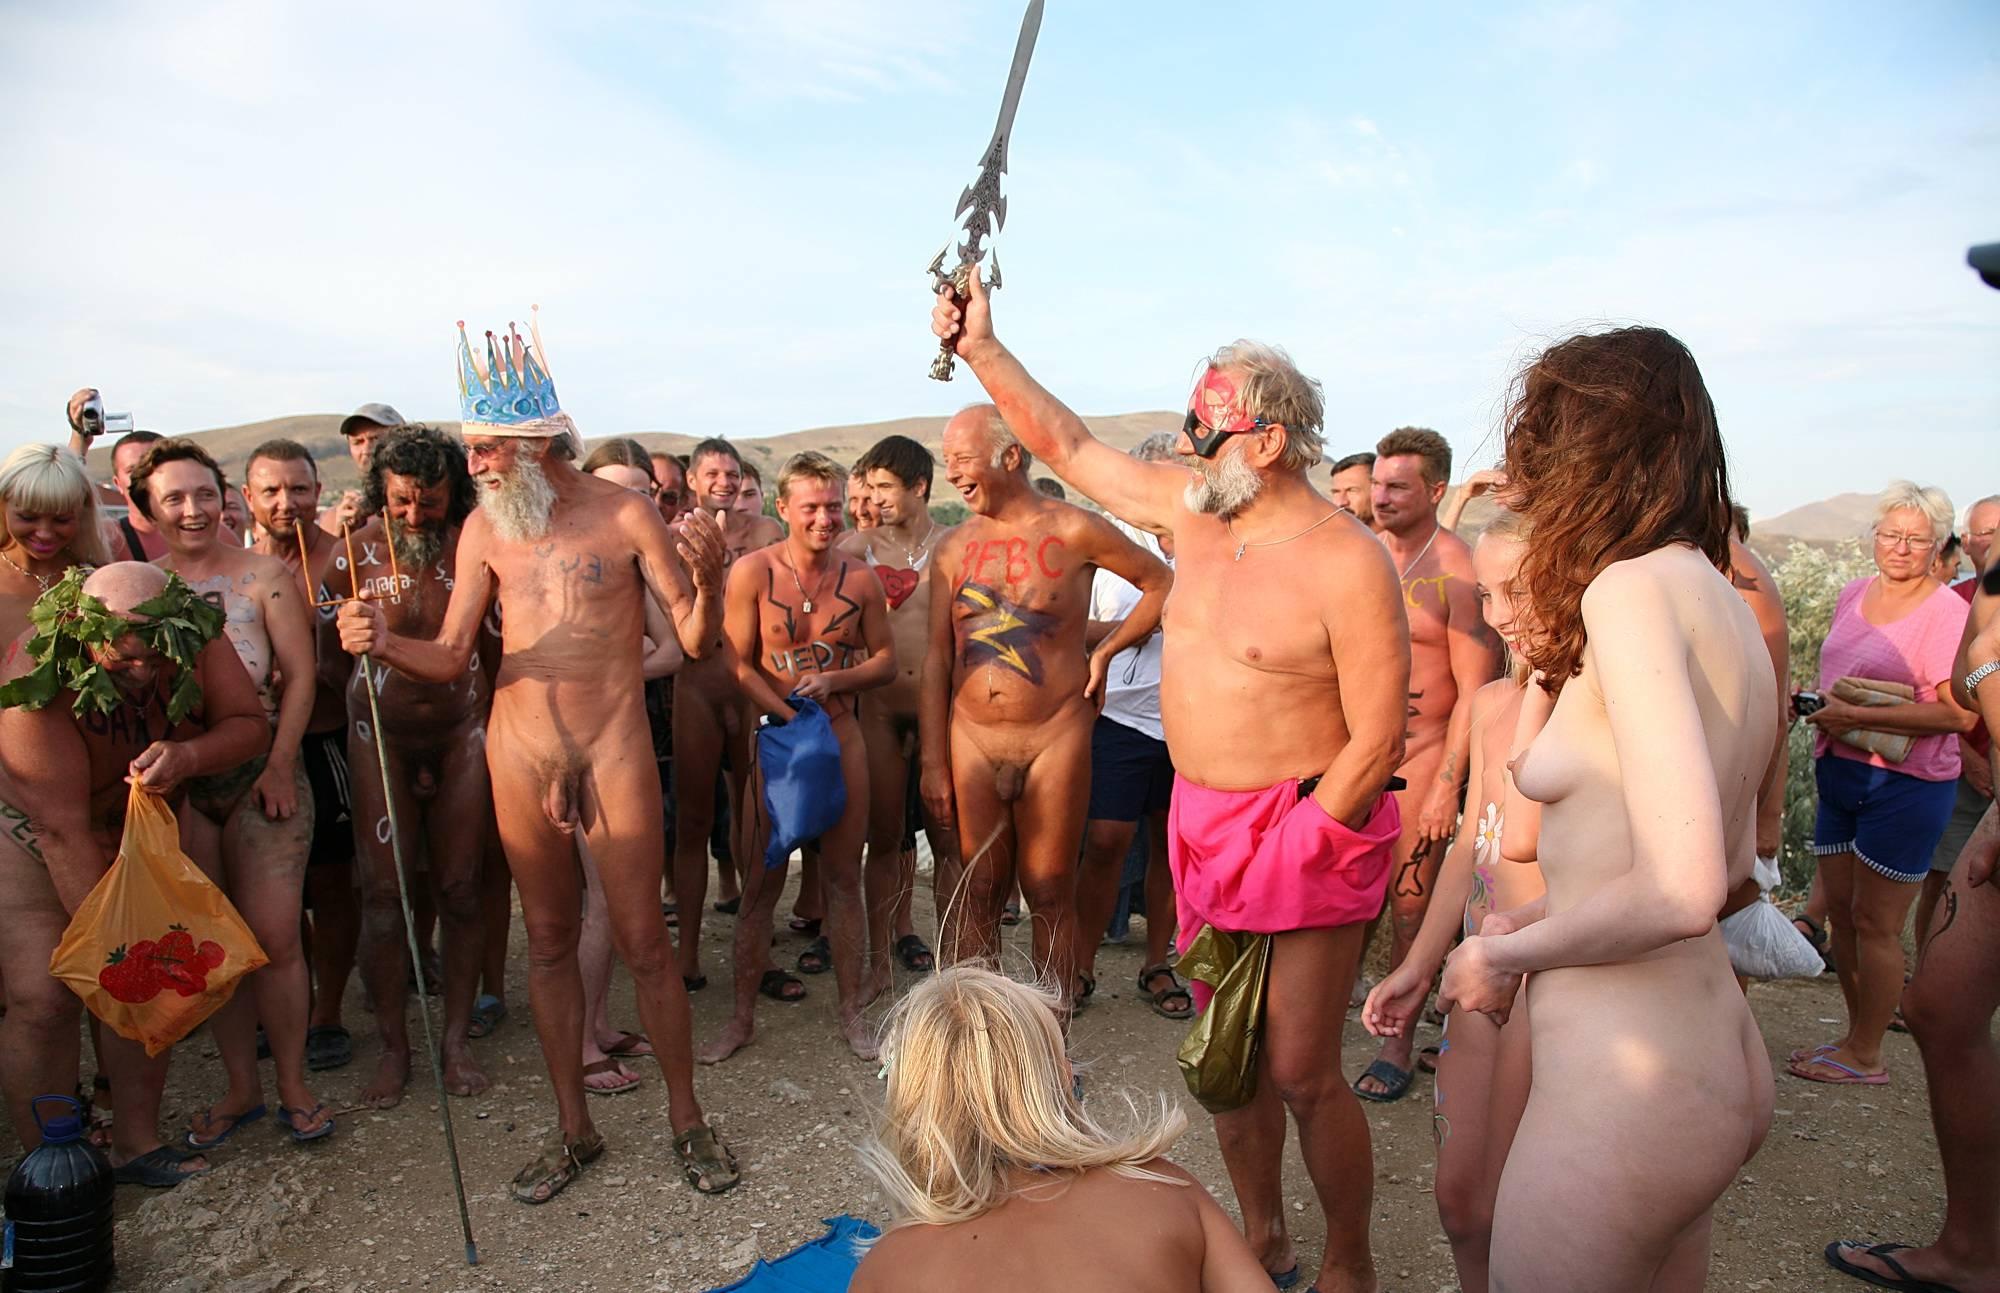 Purenudism Photos-Bright Beach Swordplay - 1